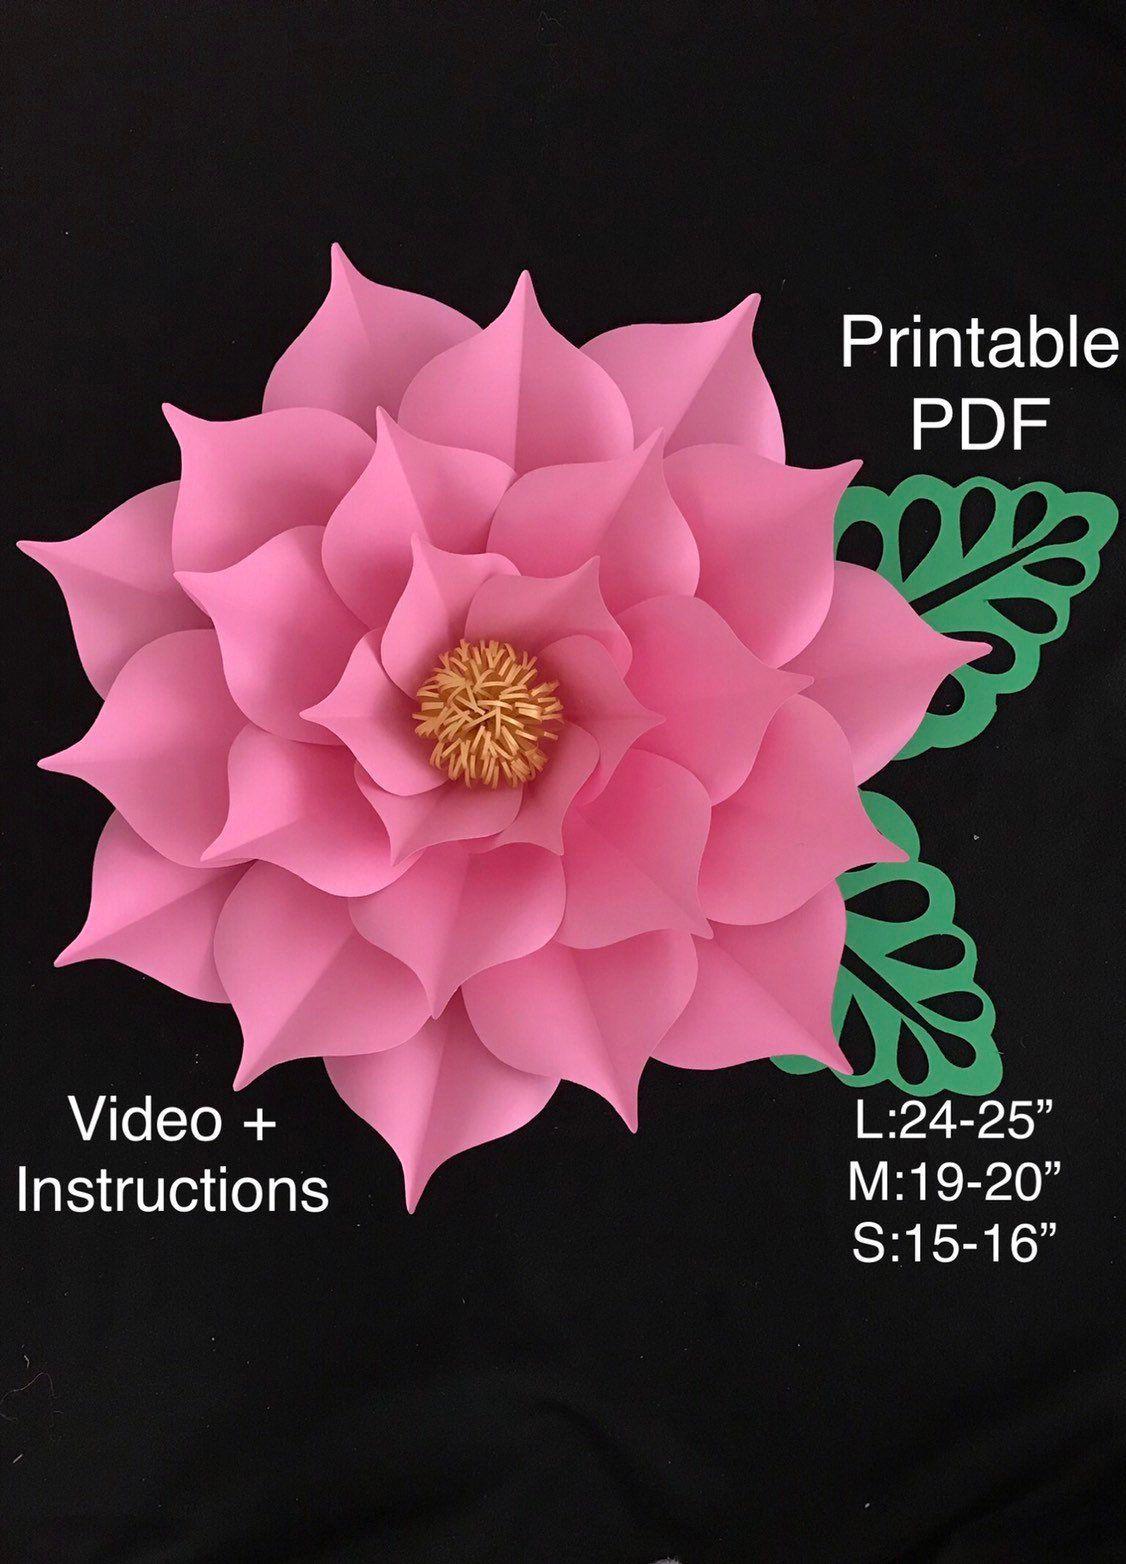 Printable Flowers for Paper Flowers Wall, Digital Paper Flower Template, Flores De Papel, Large 3D Paper Flowers, Giant Paper Flowers #giantpaperflowers